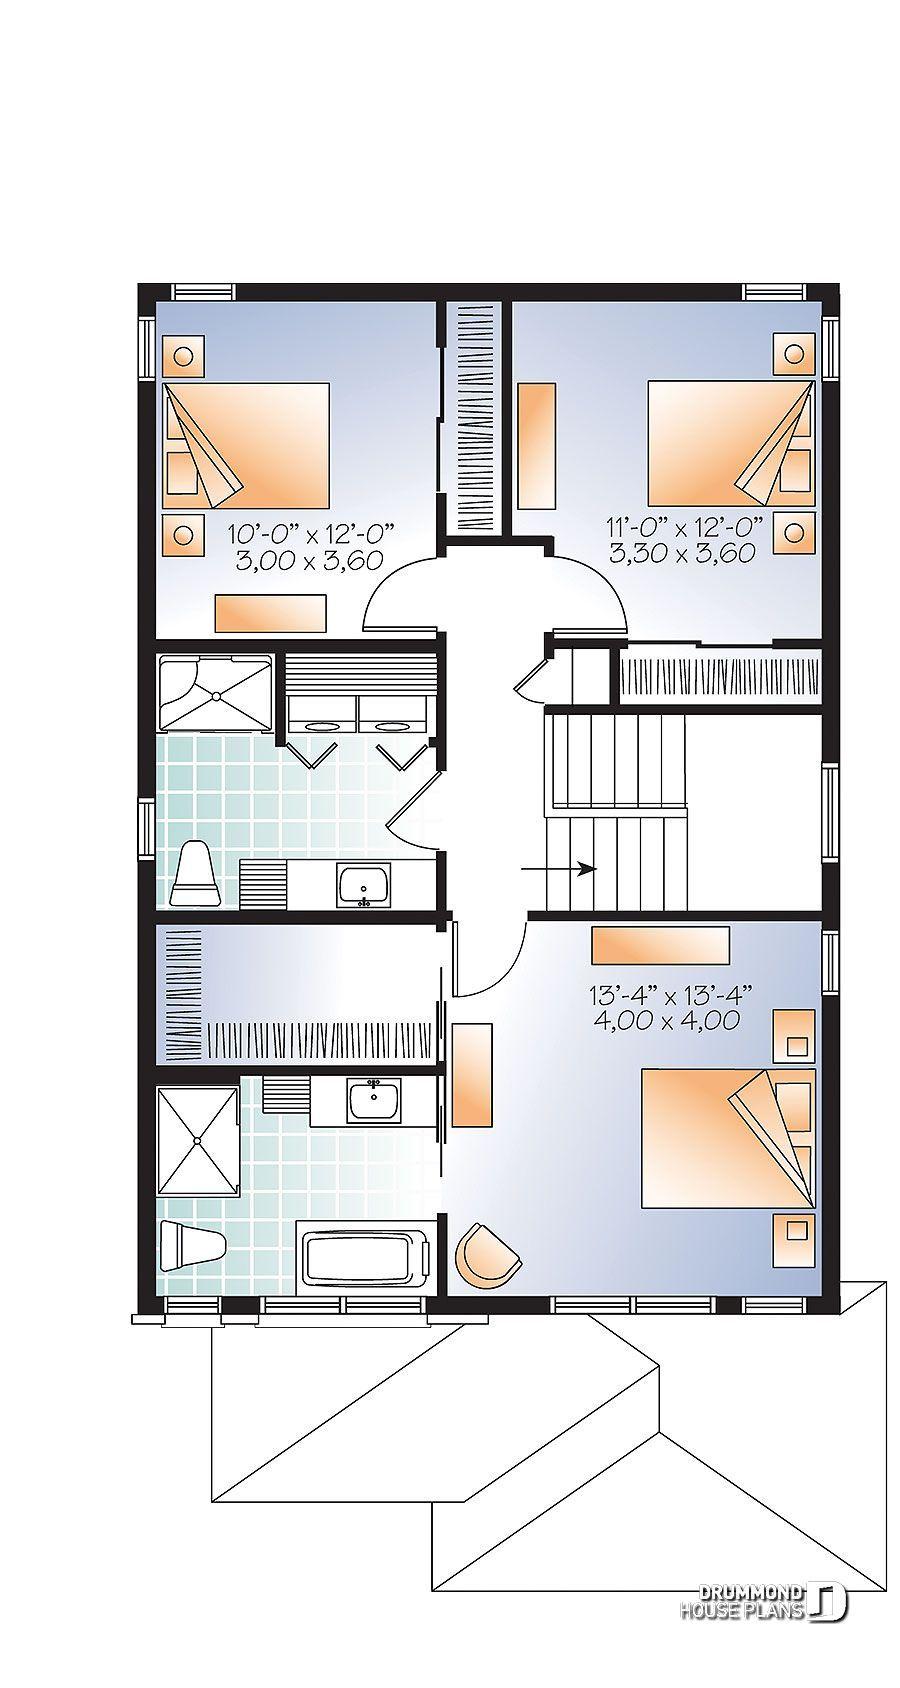 House Plan Stanton 2 No 3877 V1 House Plans Modern Style House Plans Modern Contemporary House Plans